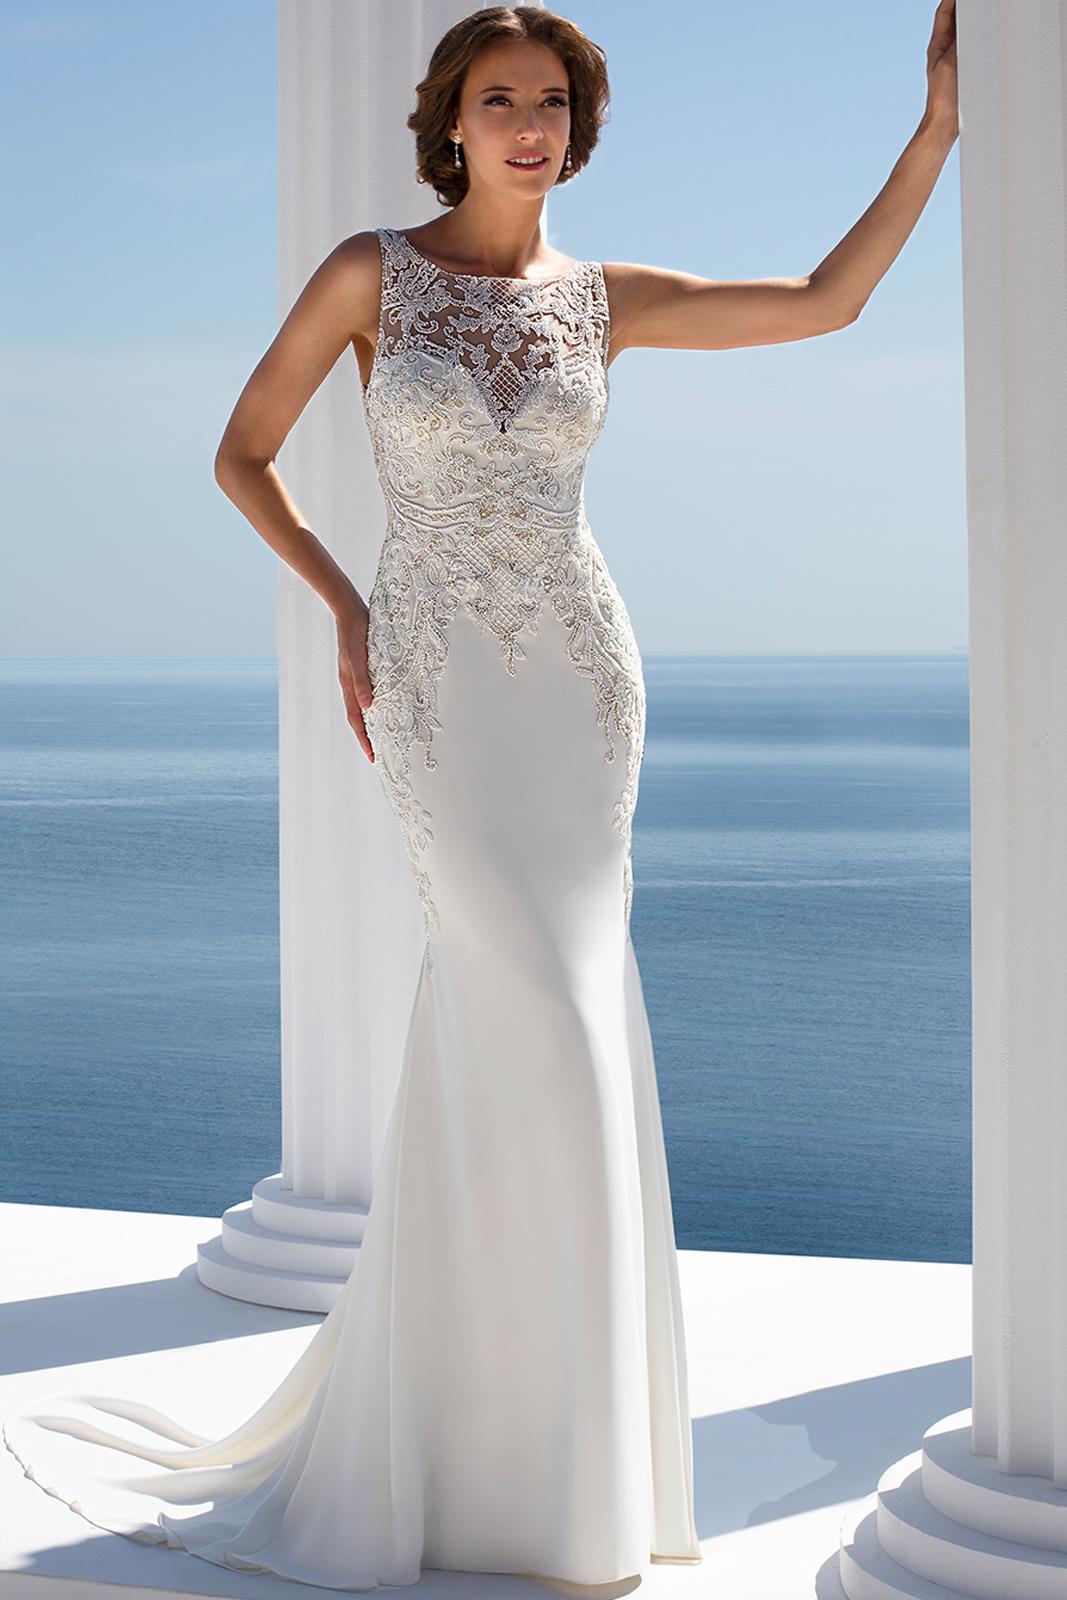 Bridal Emporium   Wedding Dresses Underwood   Easy Weddings